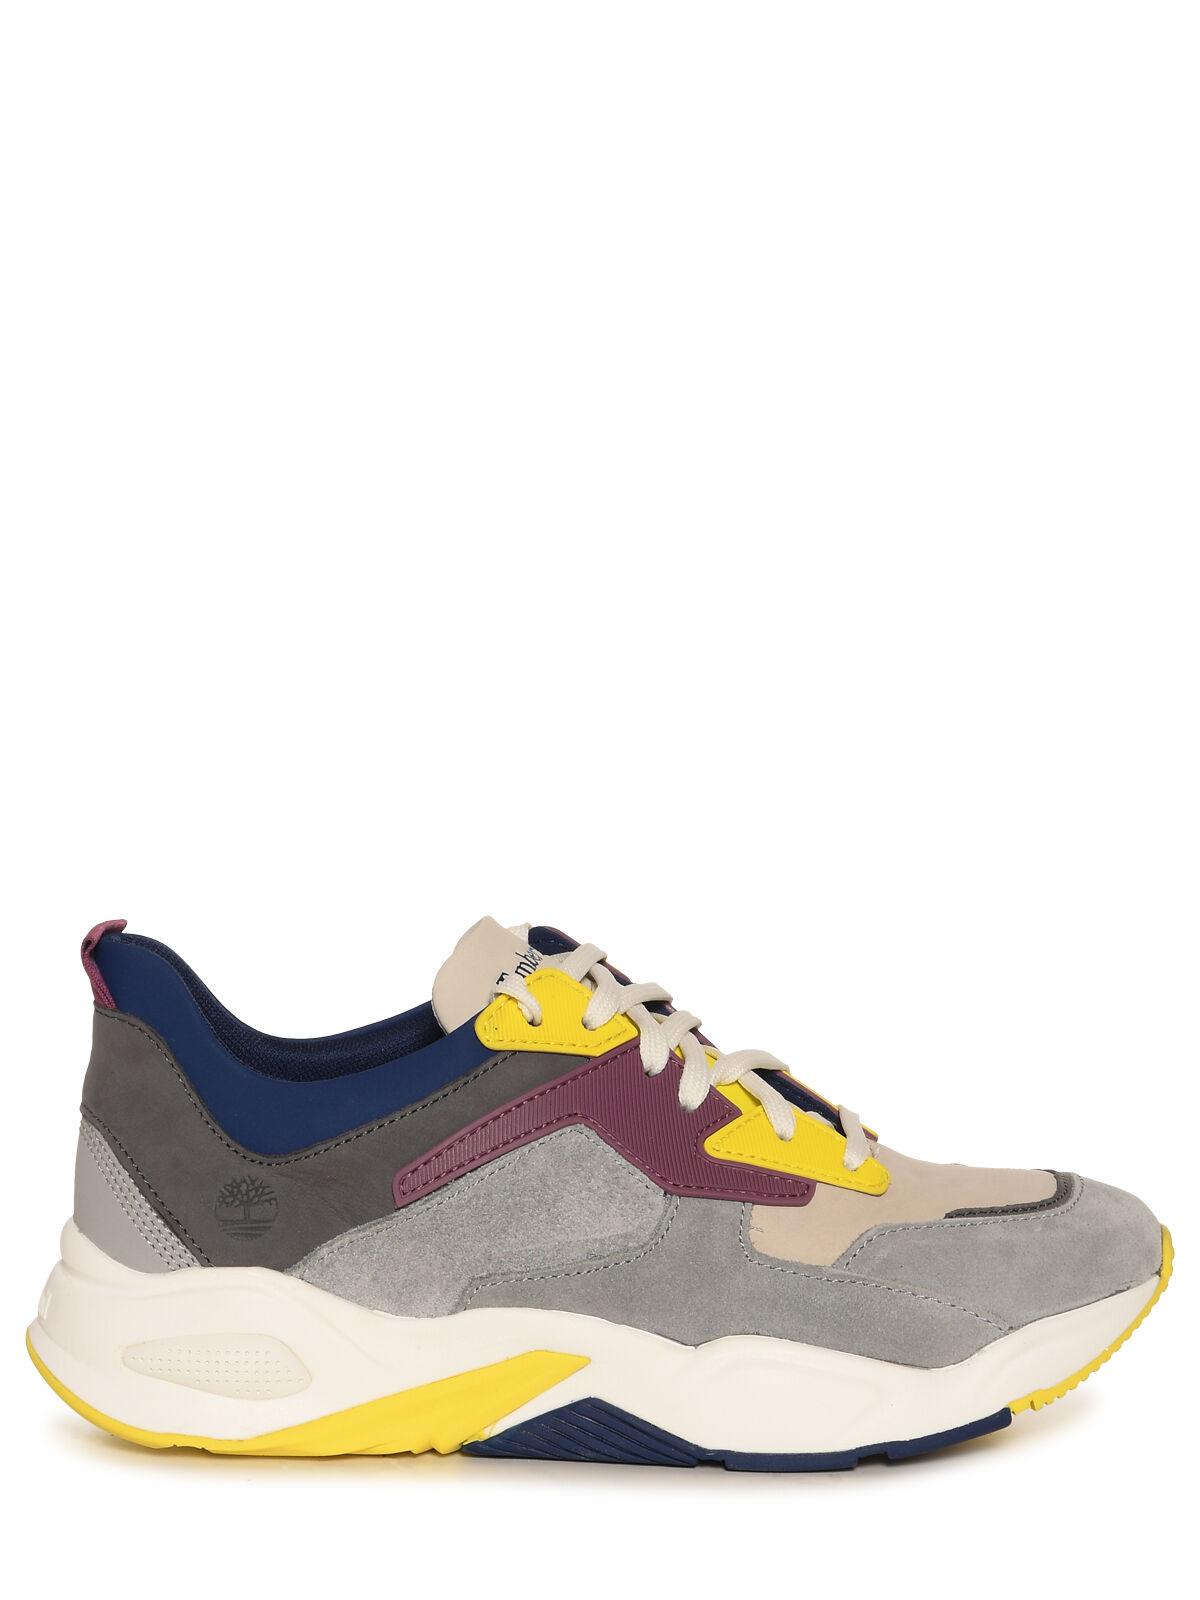 Timberland Sneaker Delphiville grau